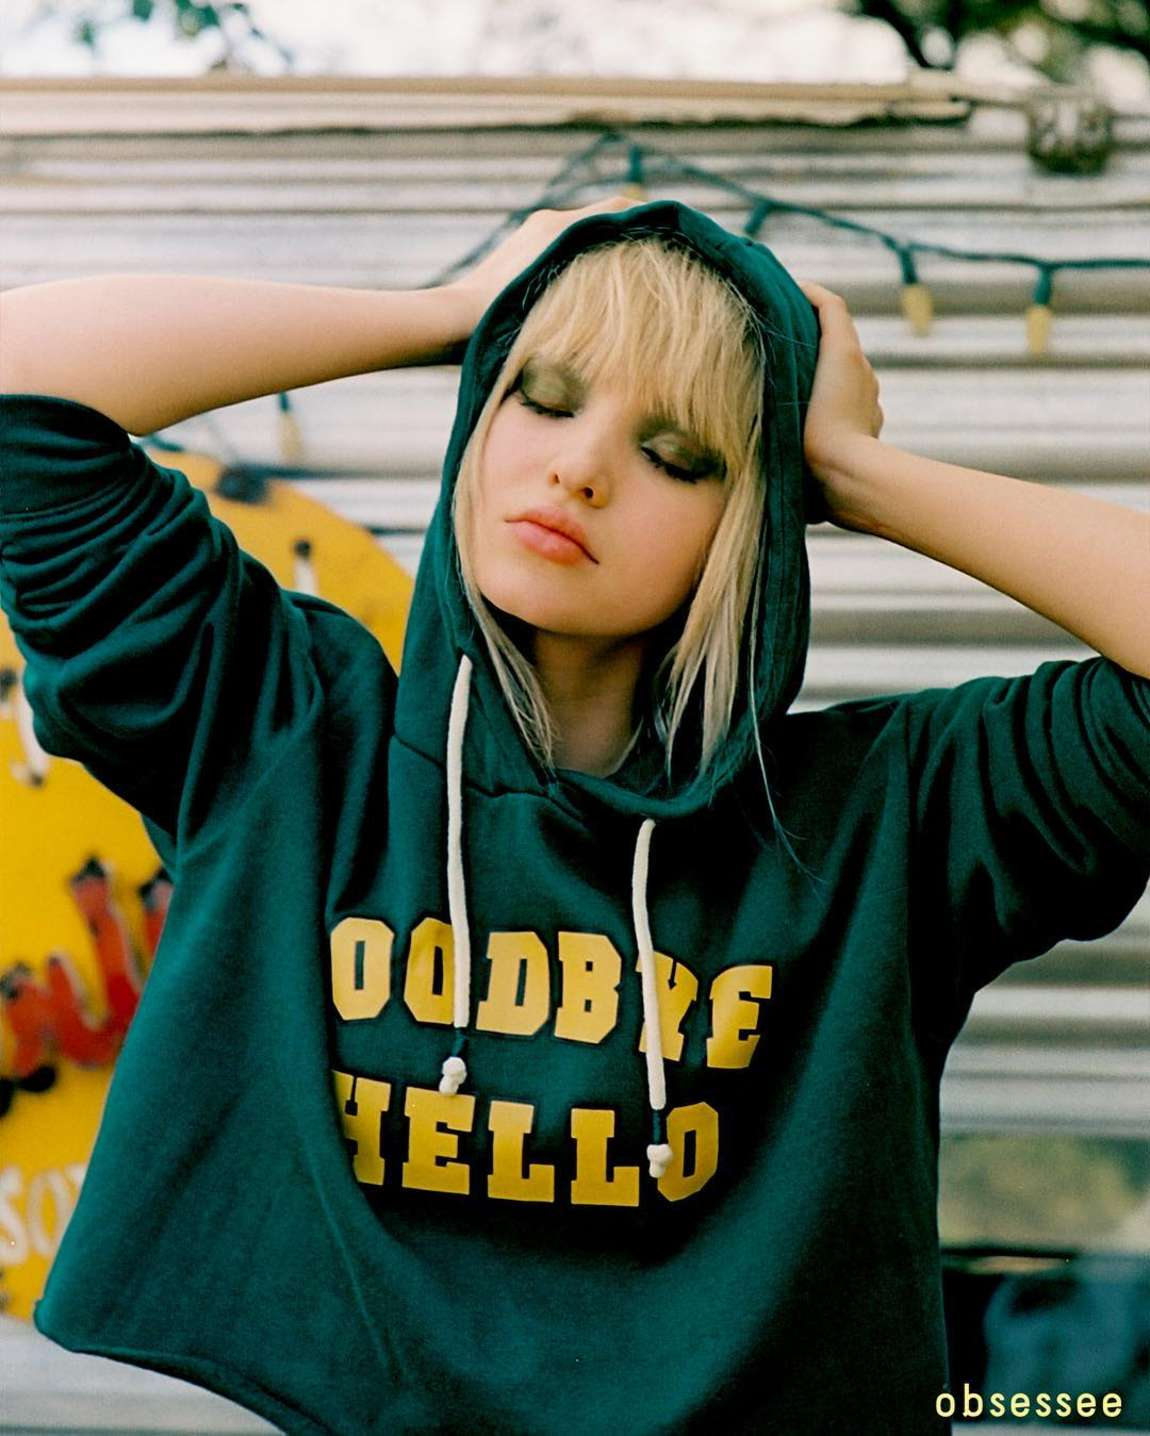 Dove Cameron - Obsessee Magazine (December 2016)